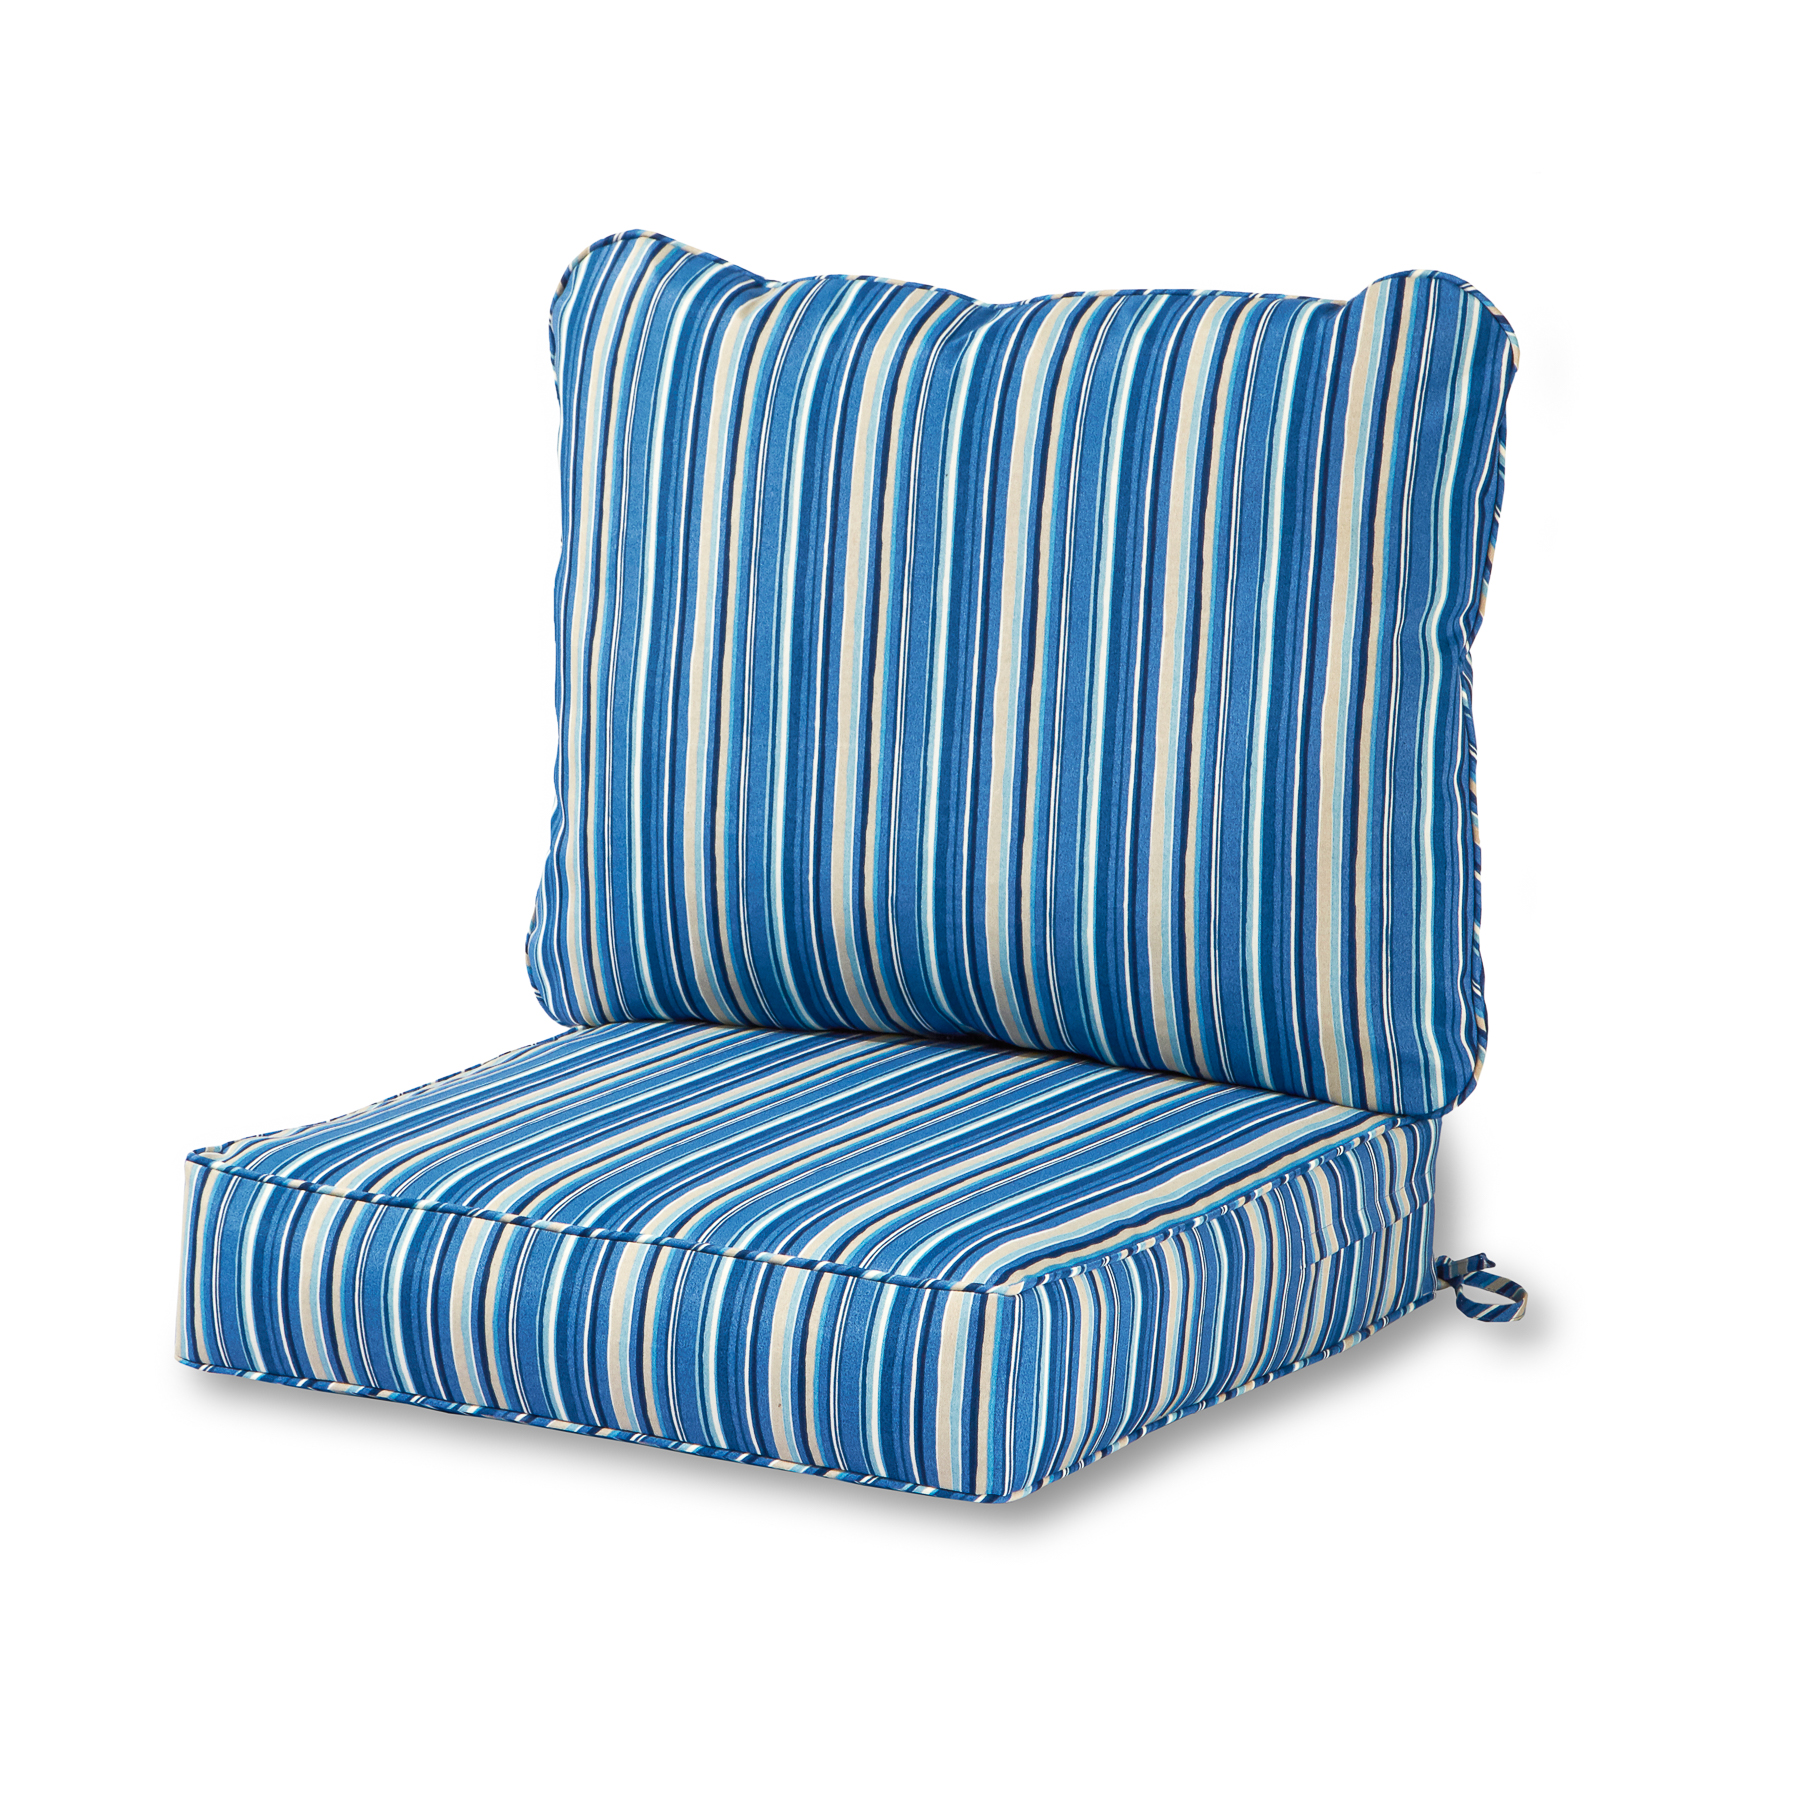 Greendale Home Fashions Outdoor Coastal Stripe Deep Seat Cushion Set